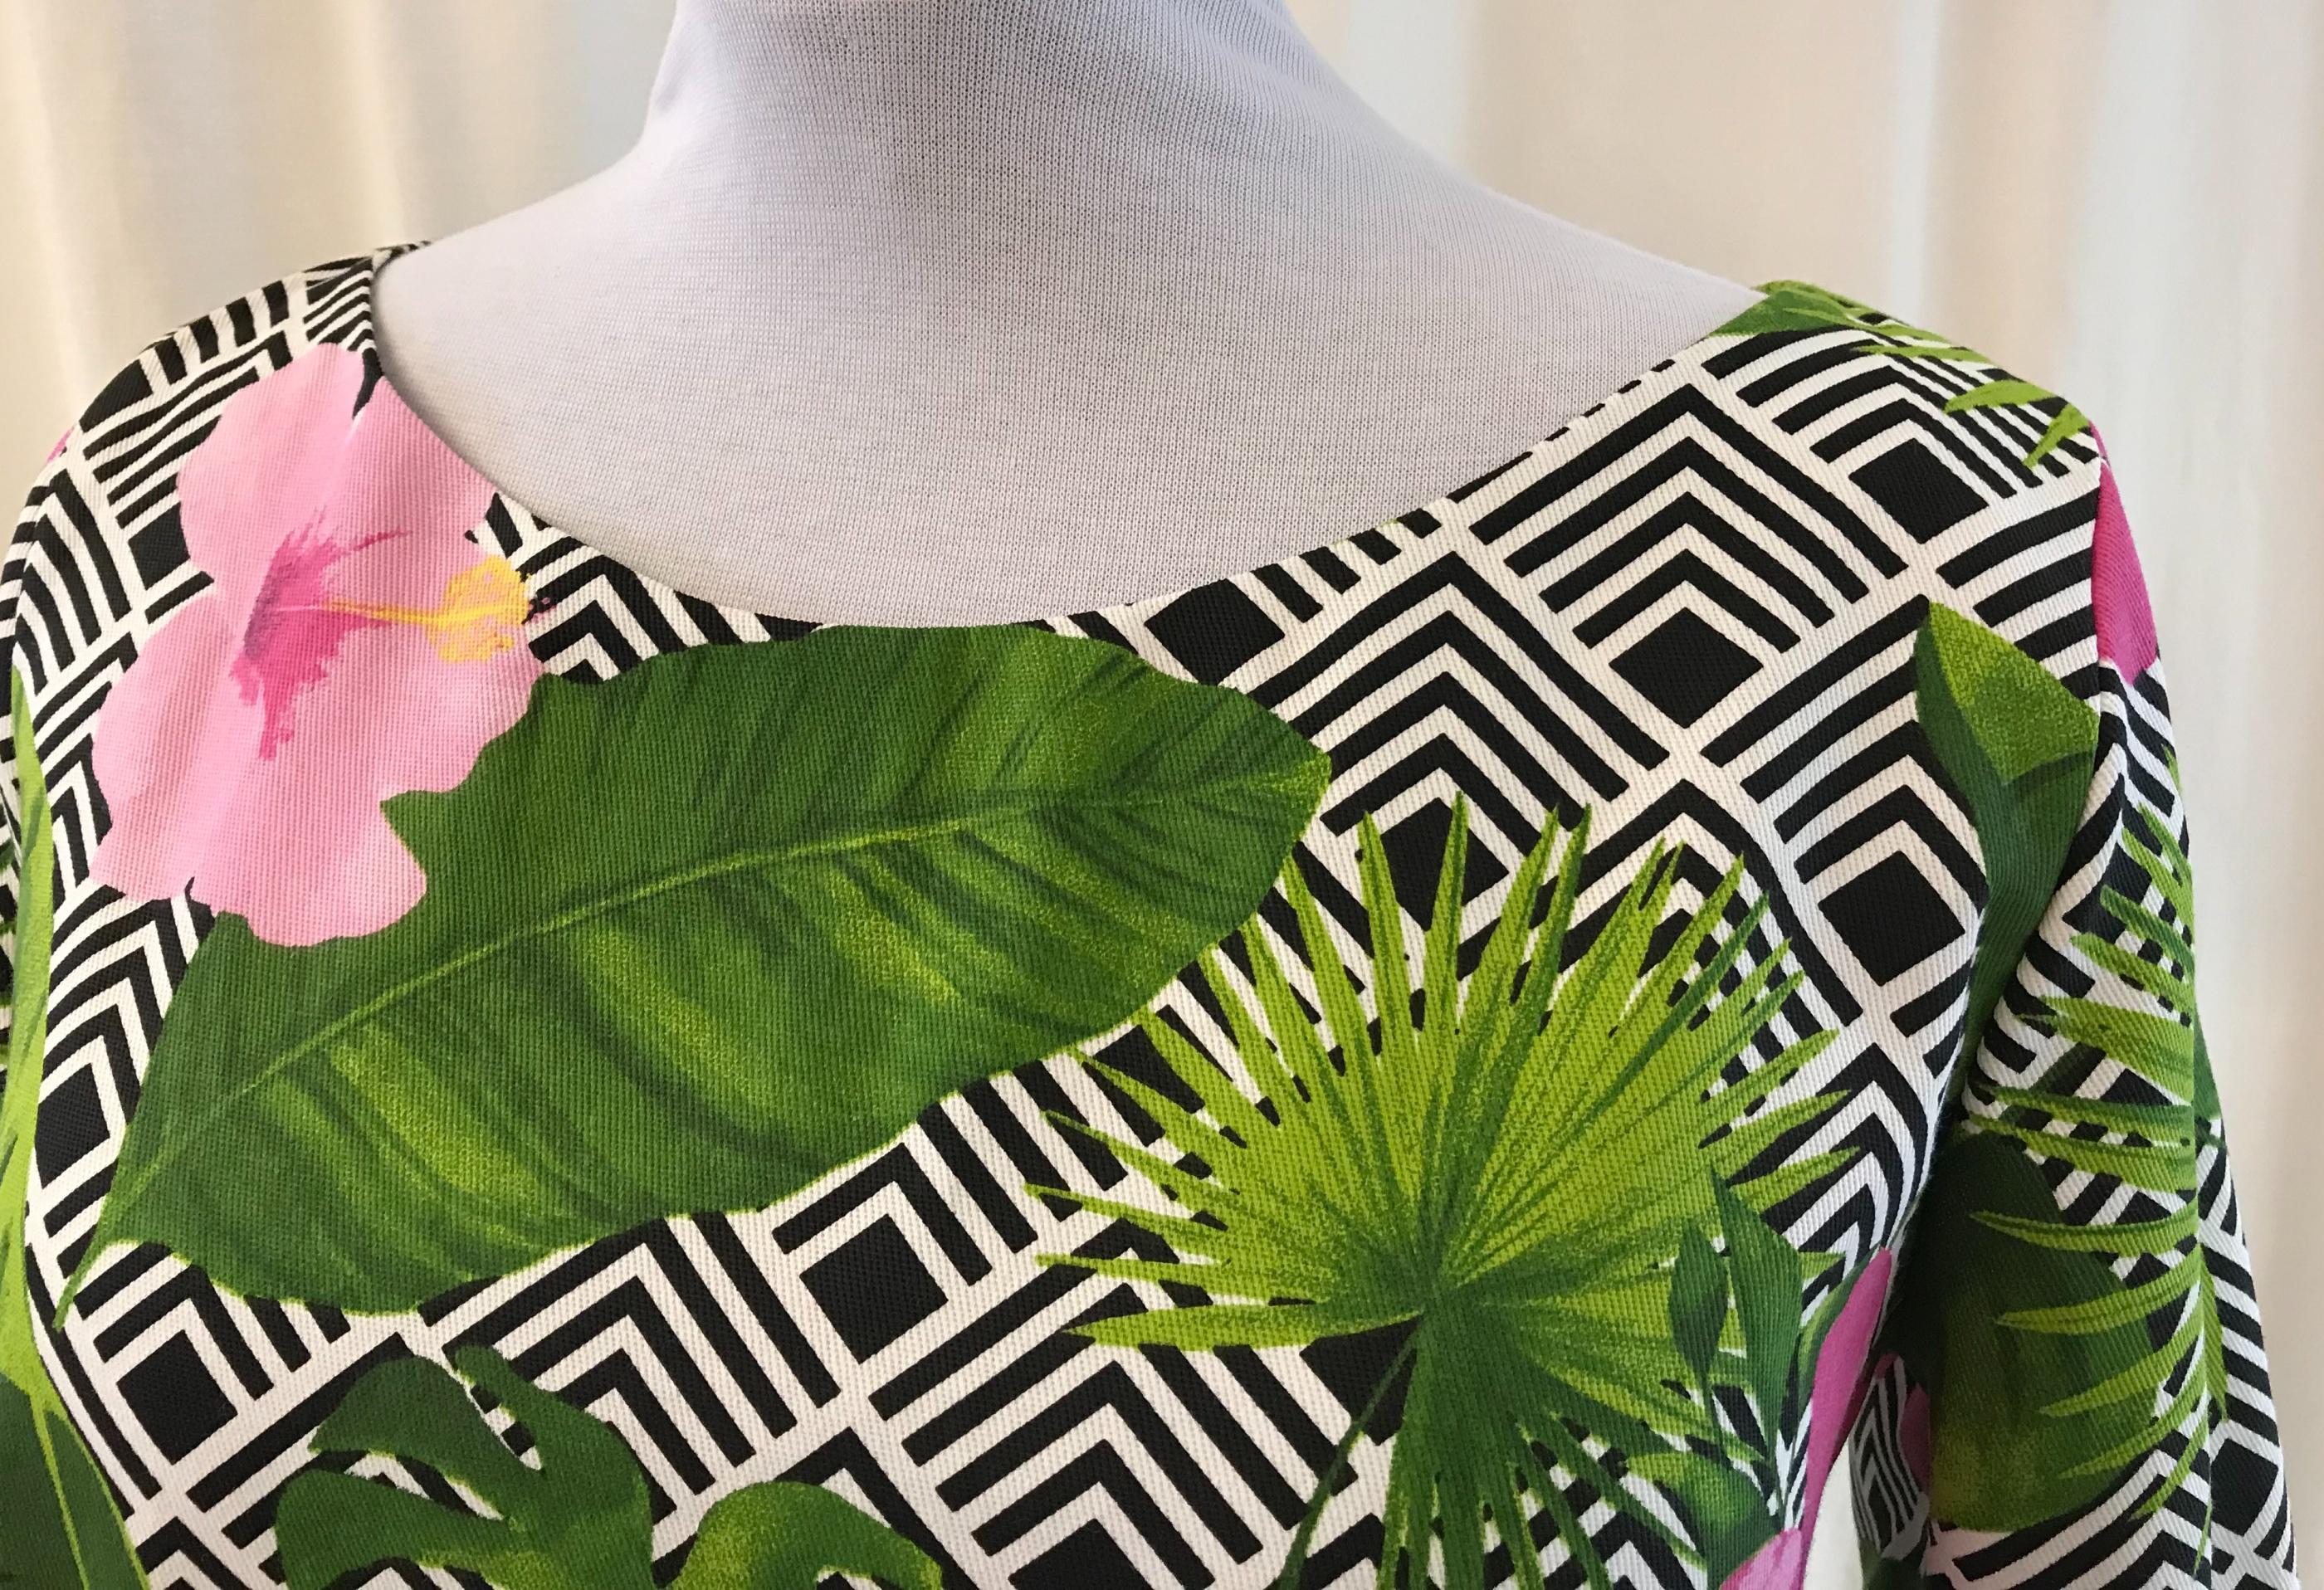 solbritt klänning SaraLaholm hibiskus mode design unik